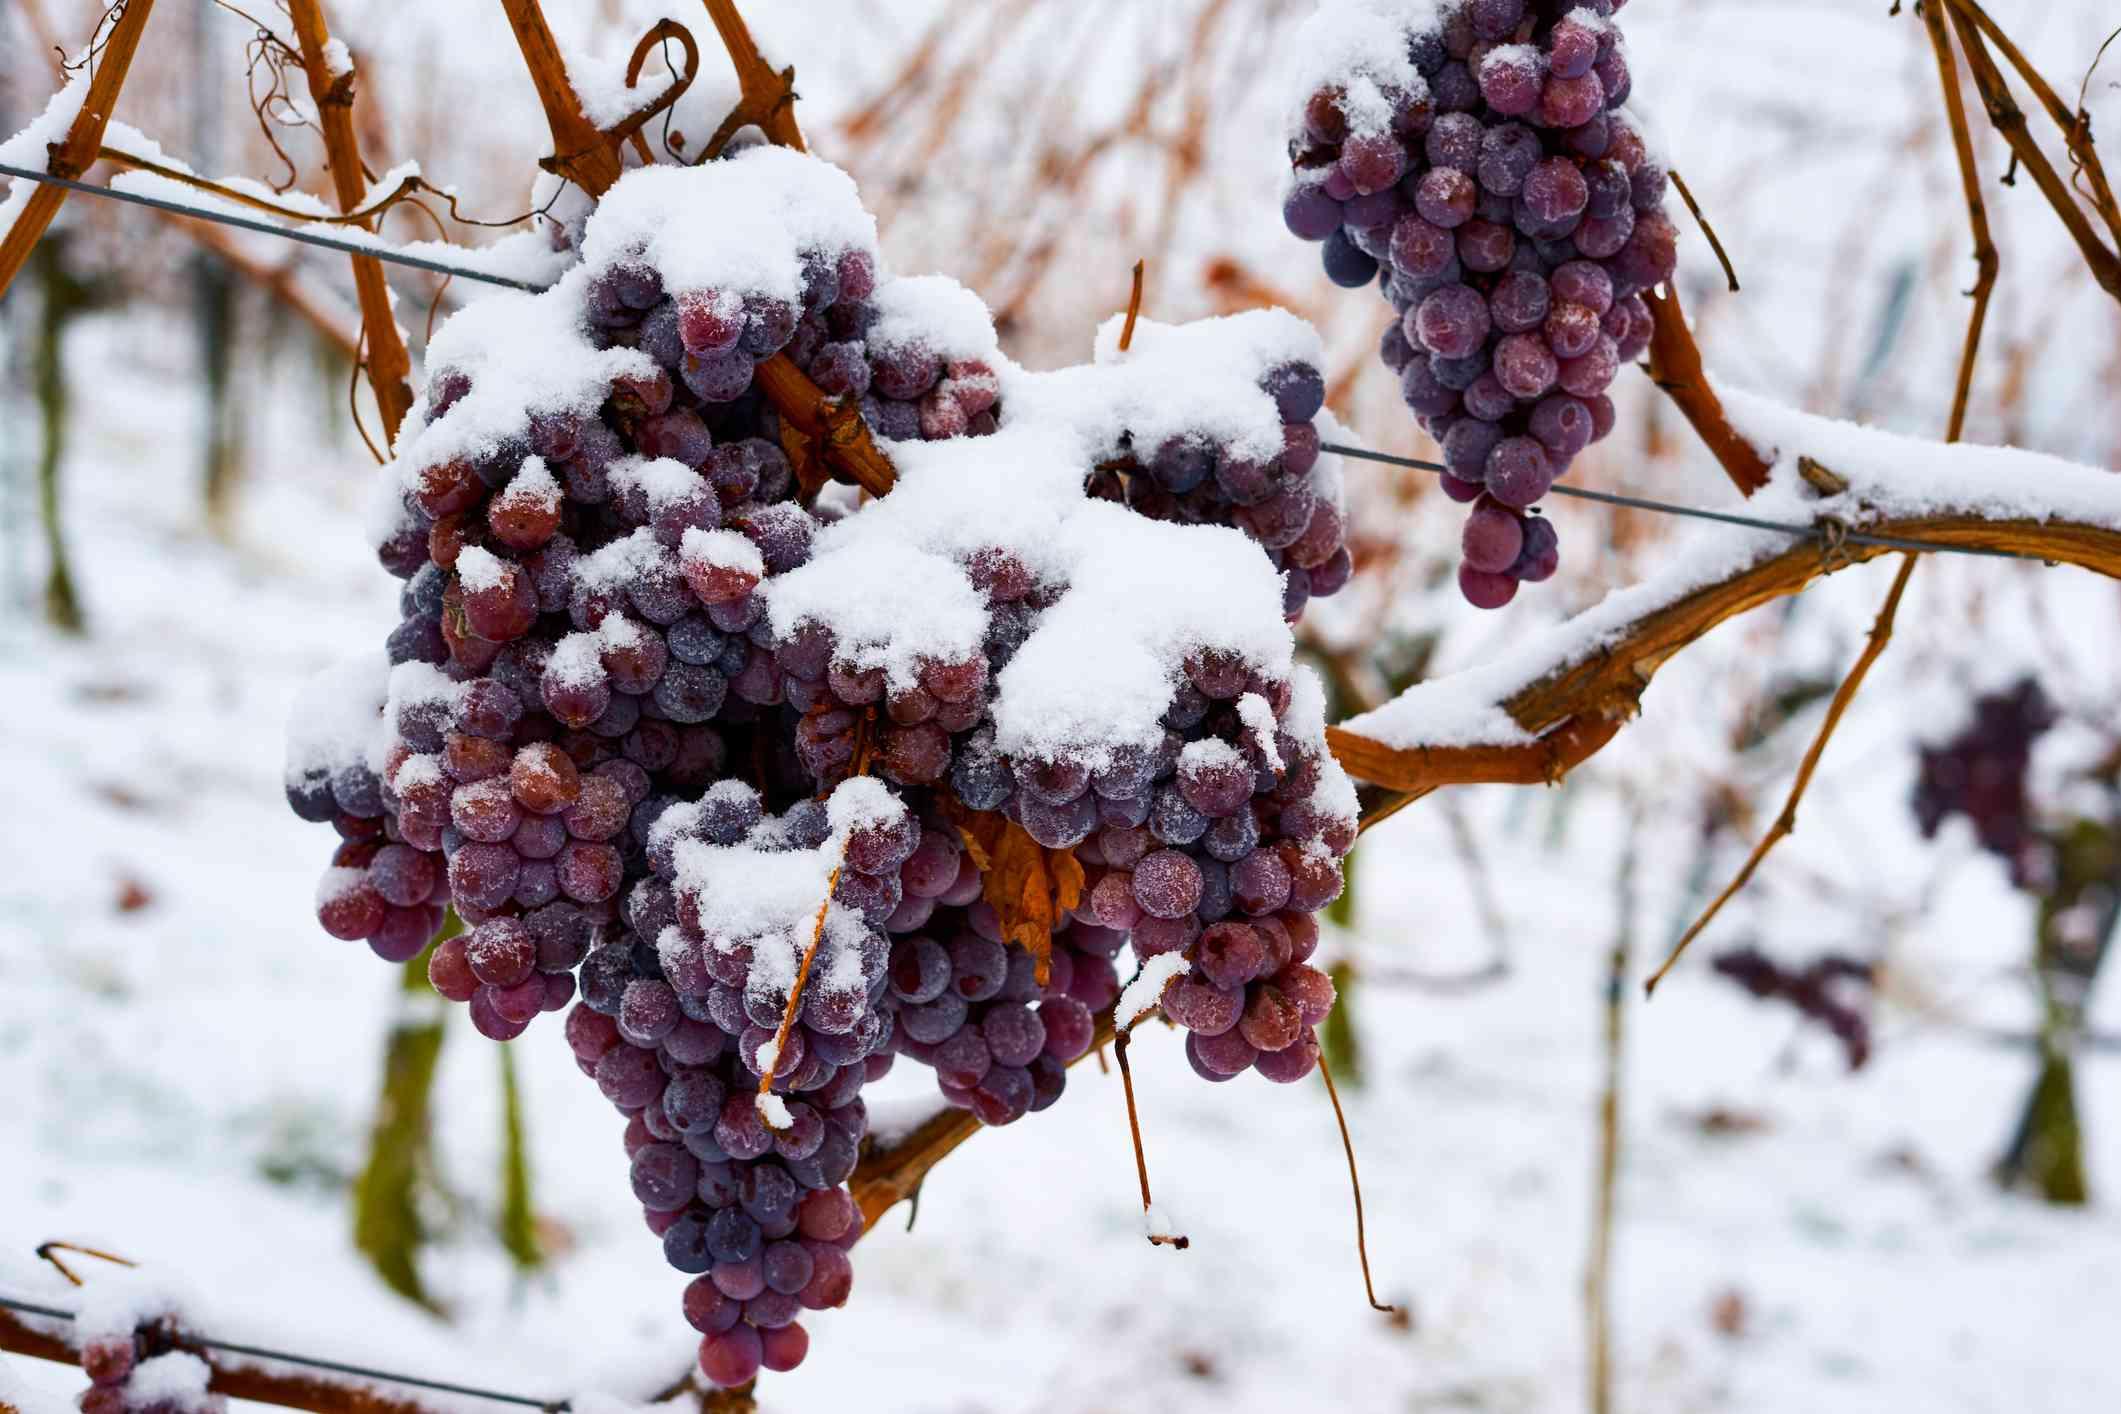 Frozen Ice Wine Grapes